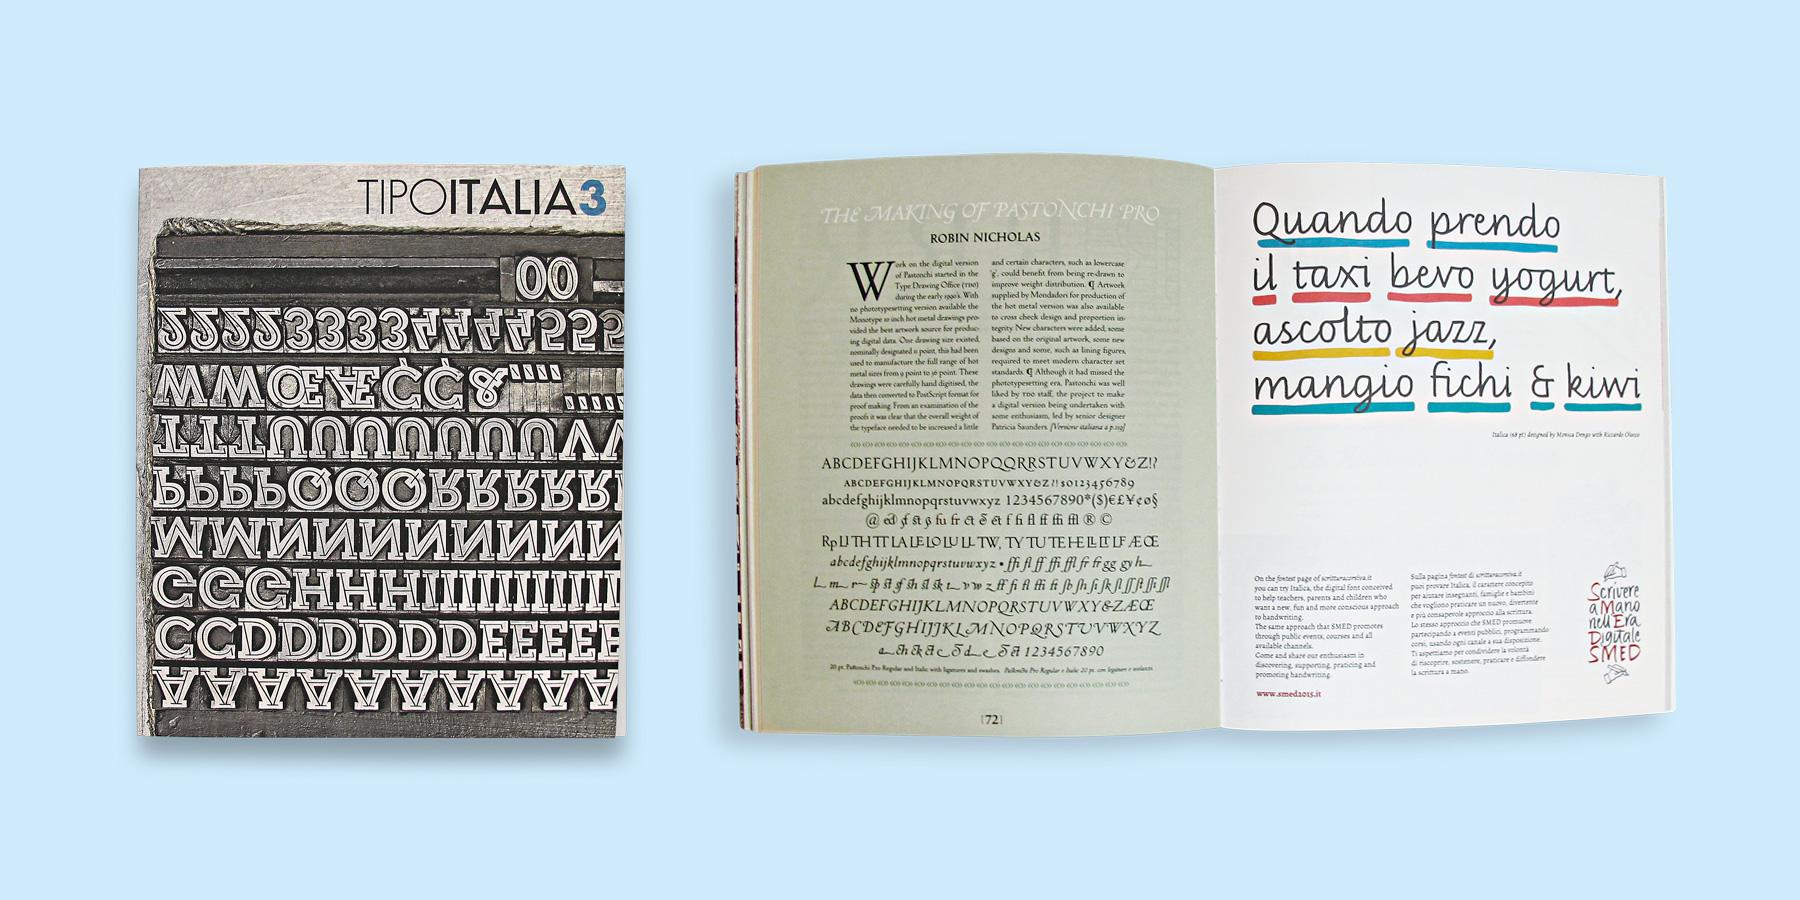 tipoteca_libro_tipoitalia3_interno